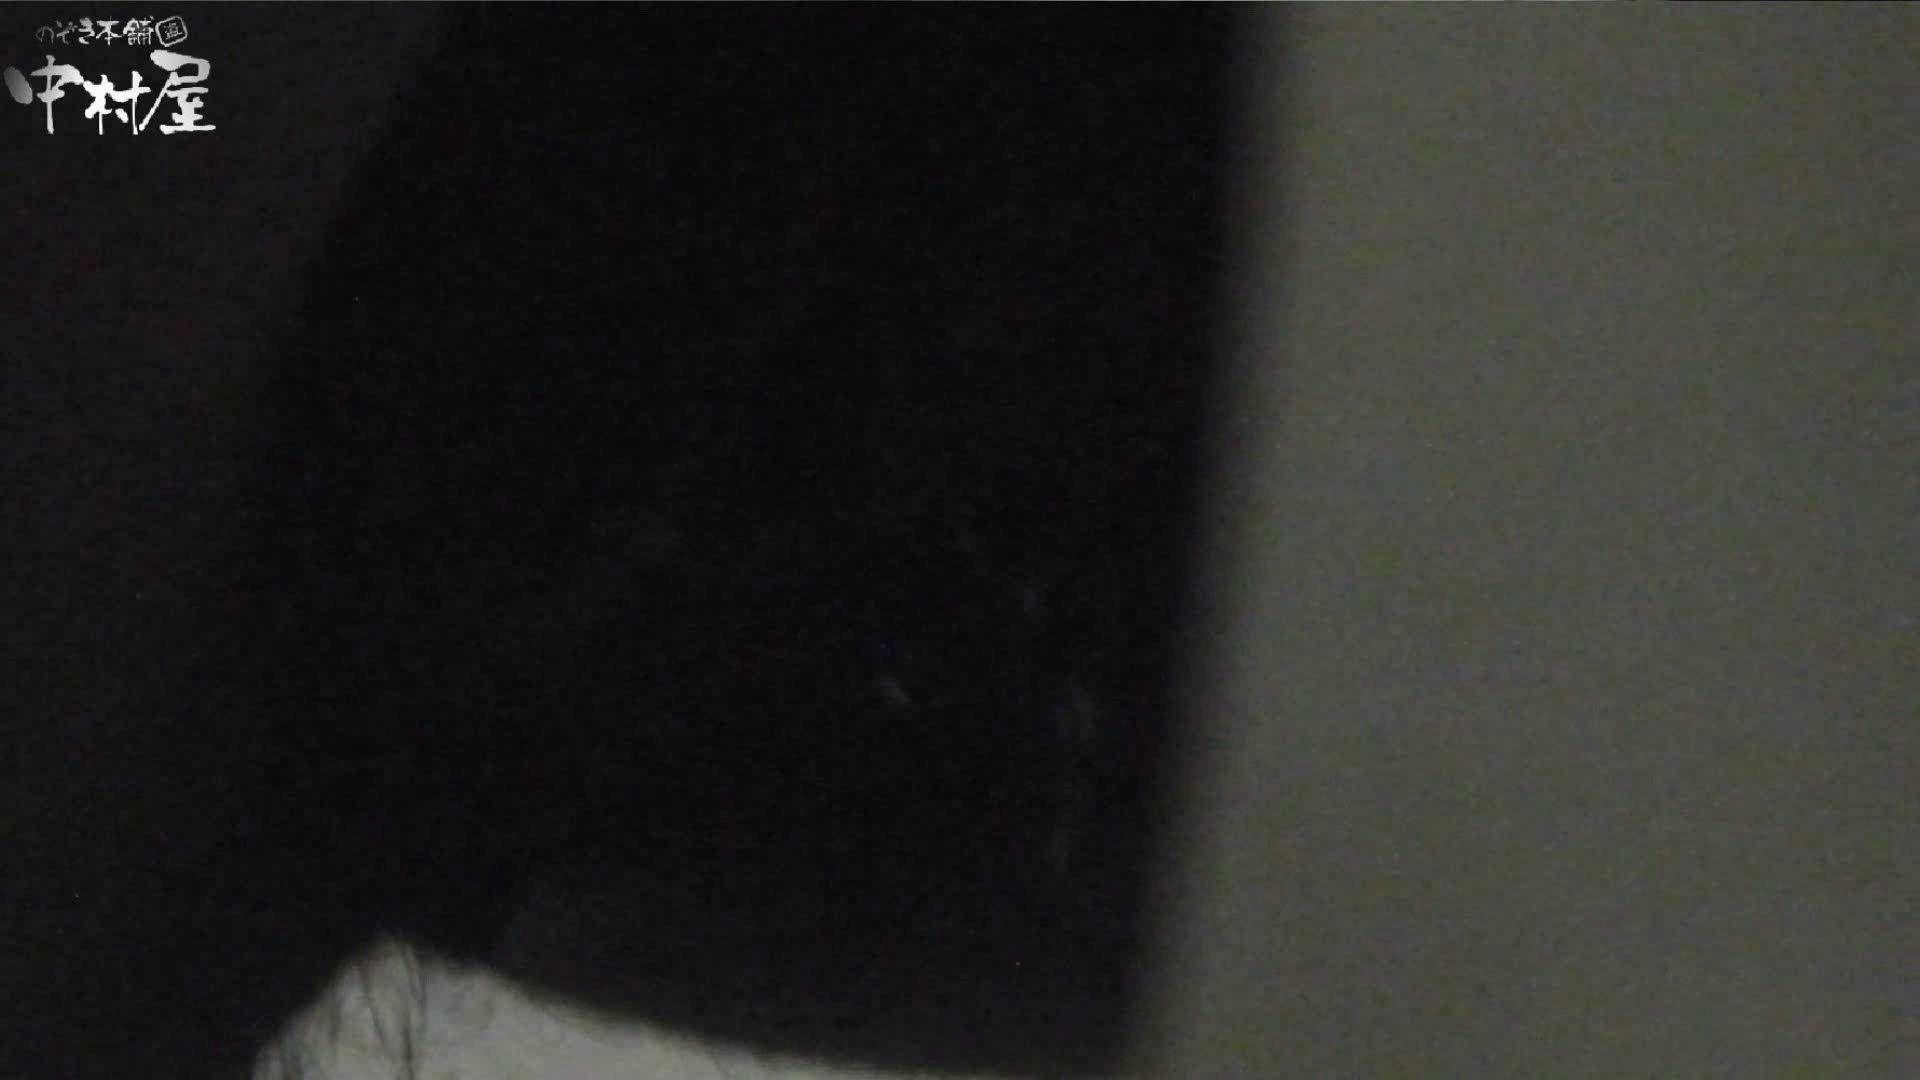 vol.42 命がけ潜伏洗面所! カカト上げながら・硬度強(太)・180g OLセックス   潜入  102画像 57